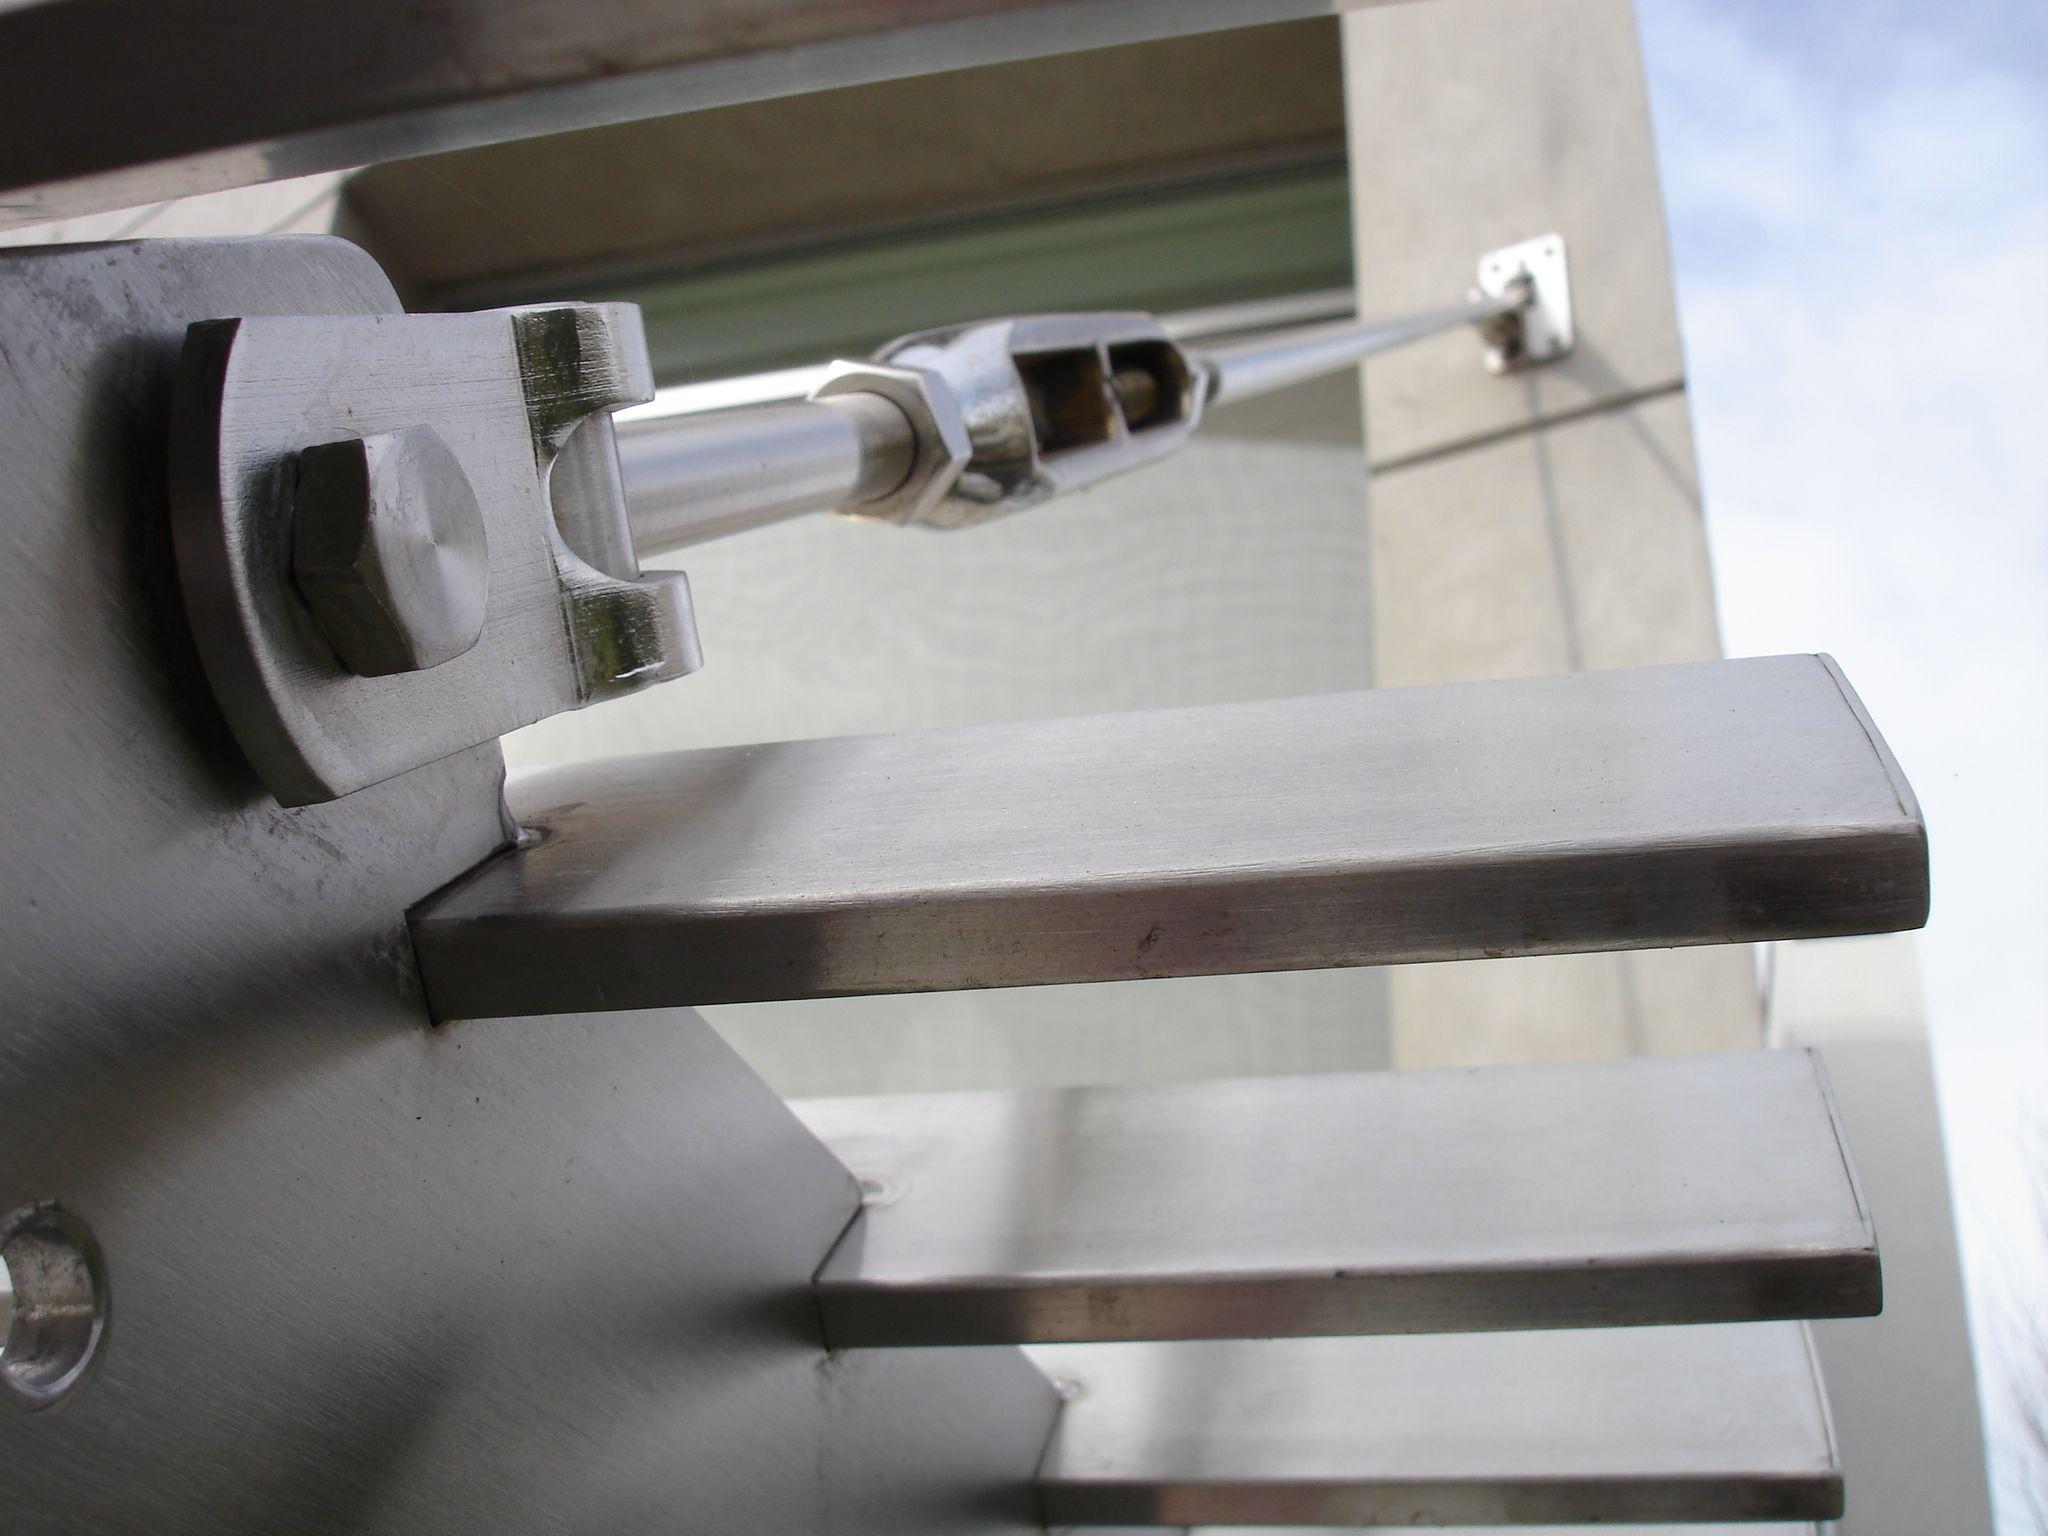 casa hormigon detalle pergola de acero inoxidable barrionuevo sierchuk arquitectas